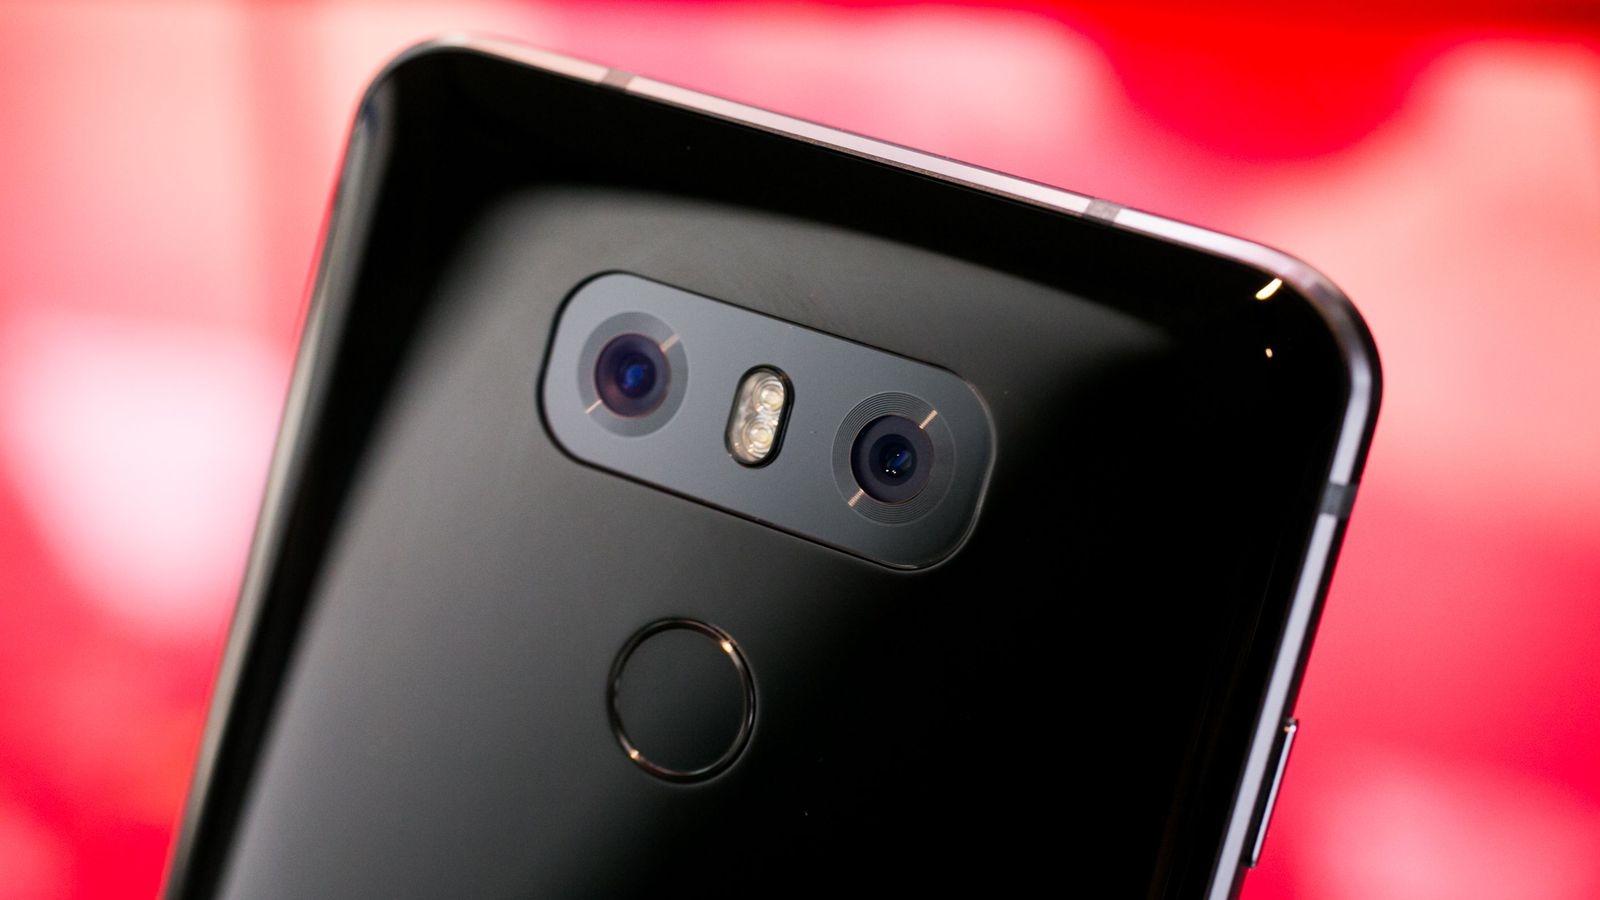 iPhone 7 Plus单挑四大安卓旗舰拍照的照片 - 3